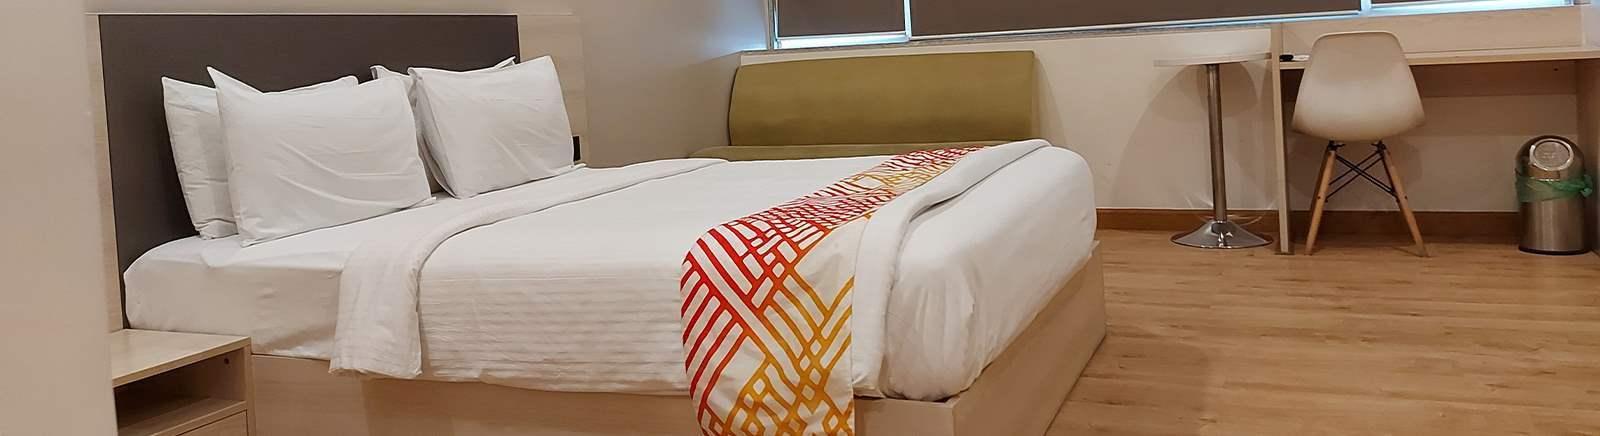 Special Offers at Ginger Aurangabad Hotel